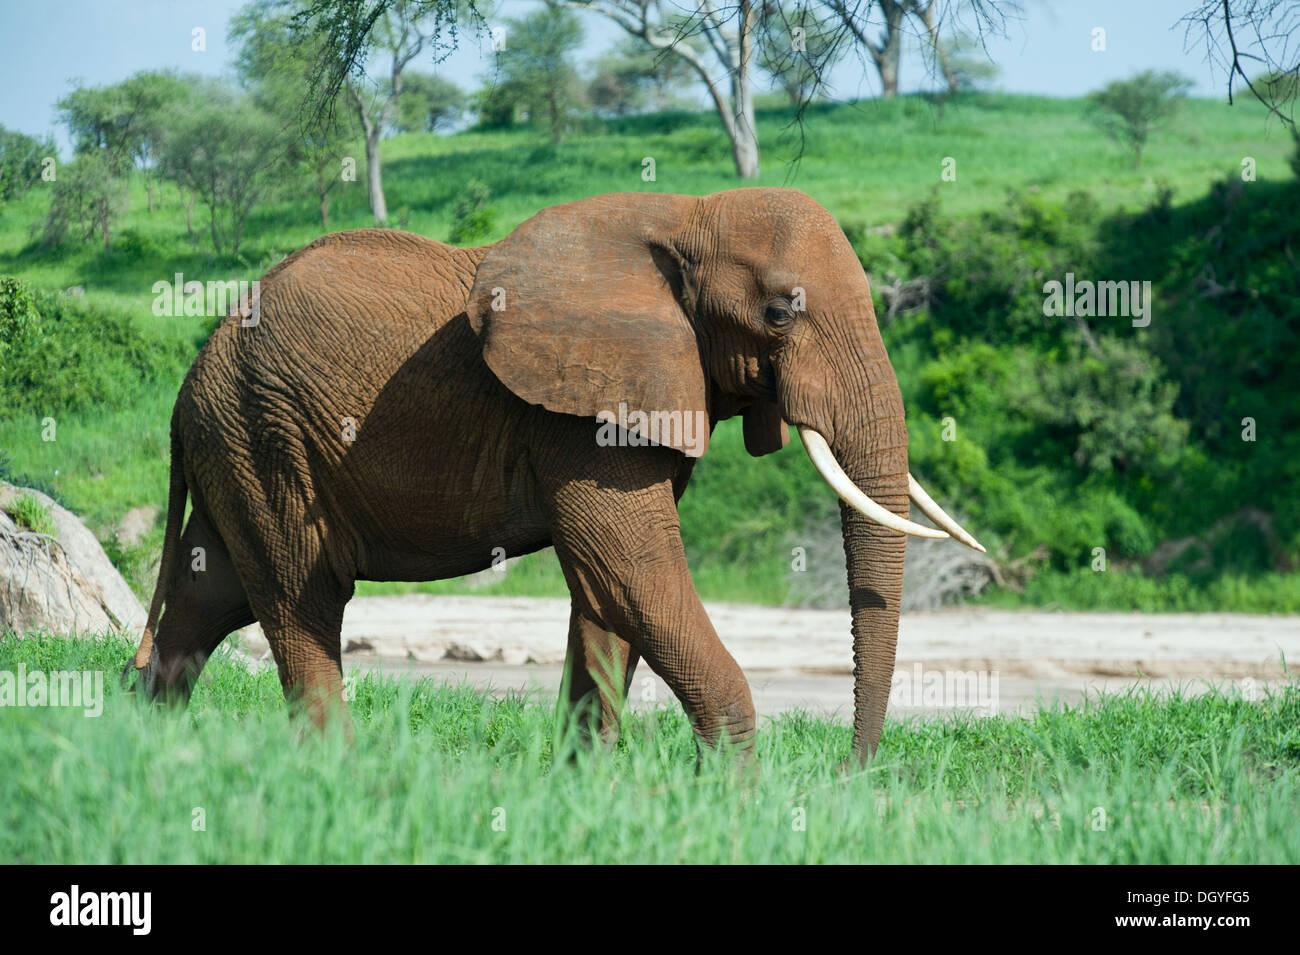 African elephant bull (Loxodonta africana) in Tarangire National Park, Tanzania - Stock Image